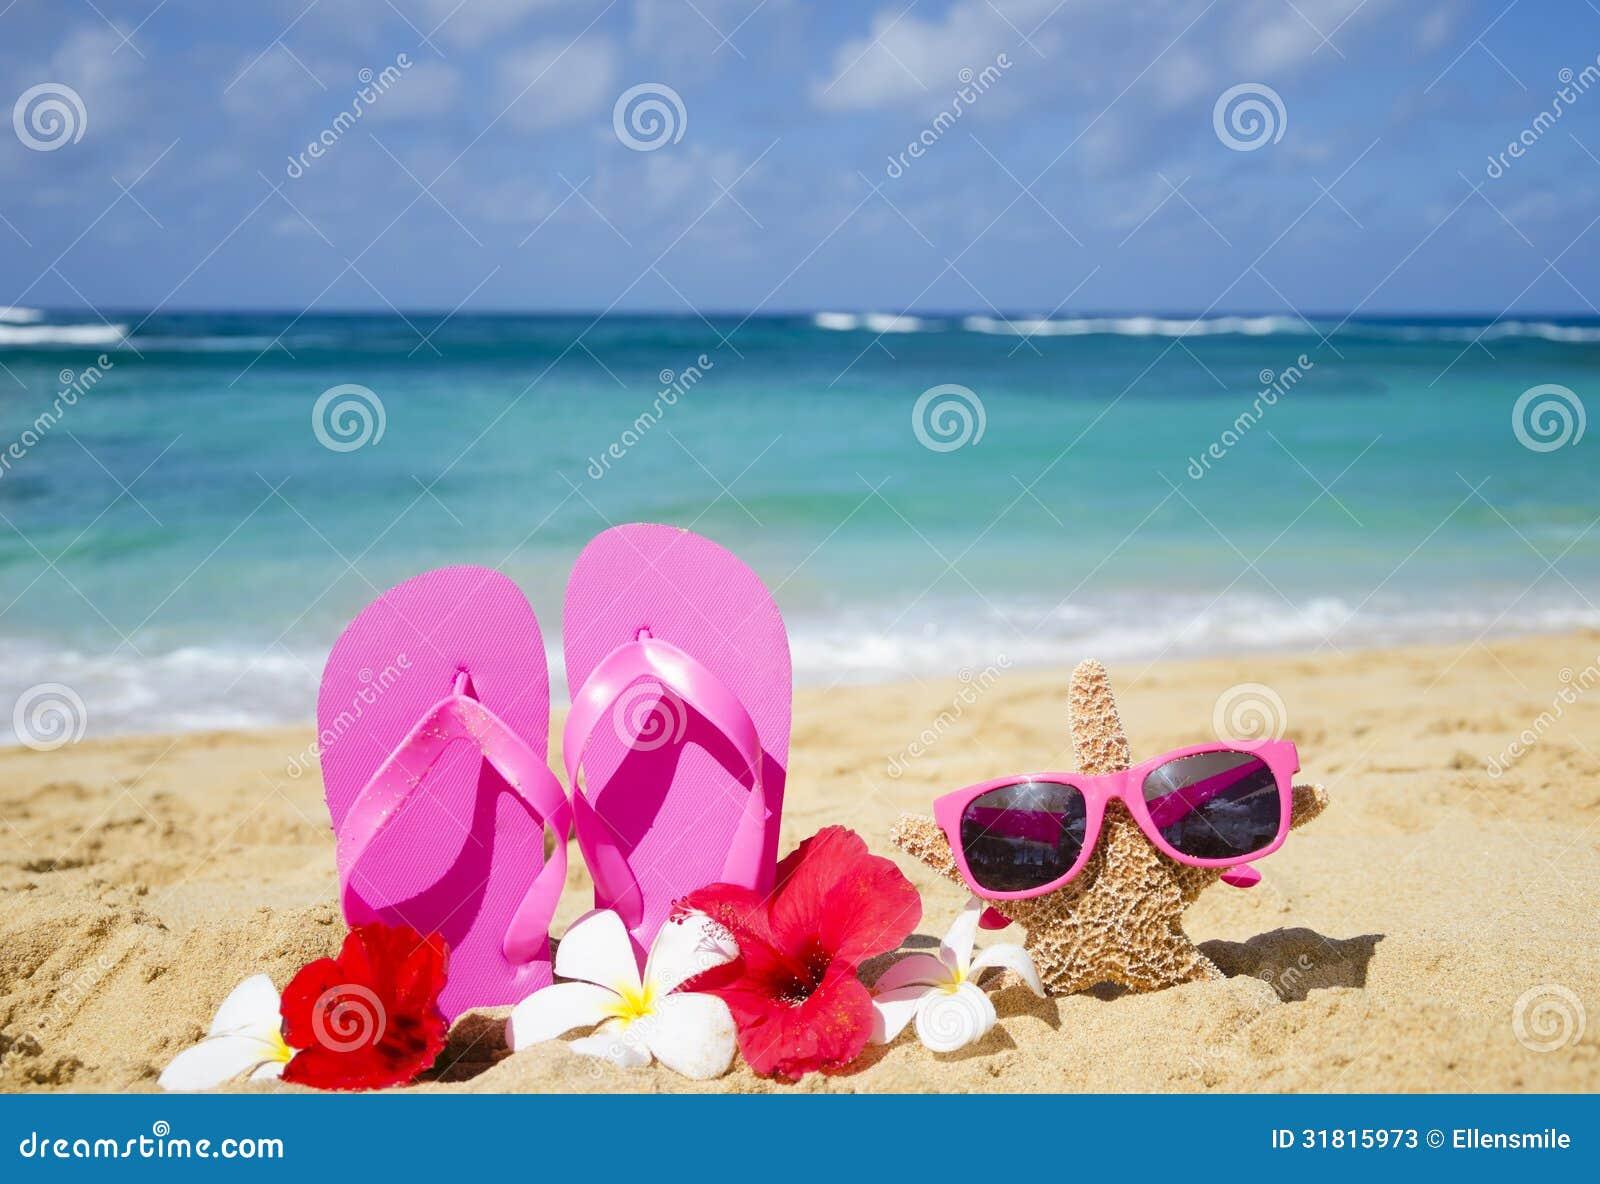 0e4ec45fc8dba Flip Flops And Starfish With Sunglasses On Sandy Beach Stock Image ...